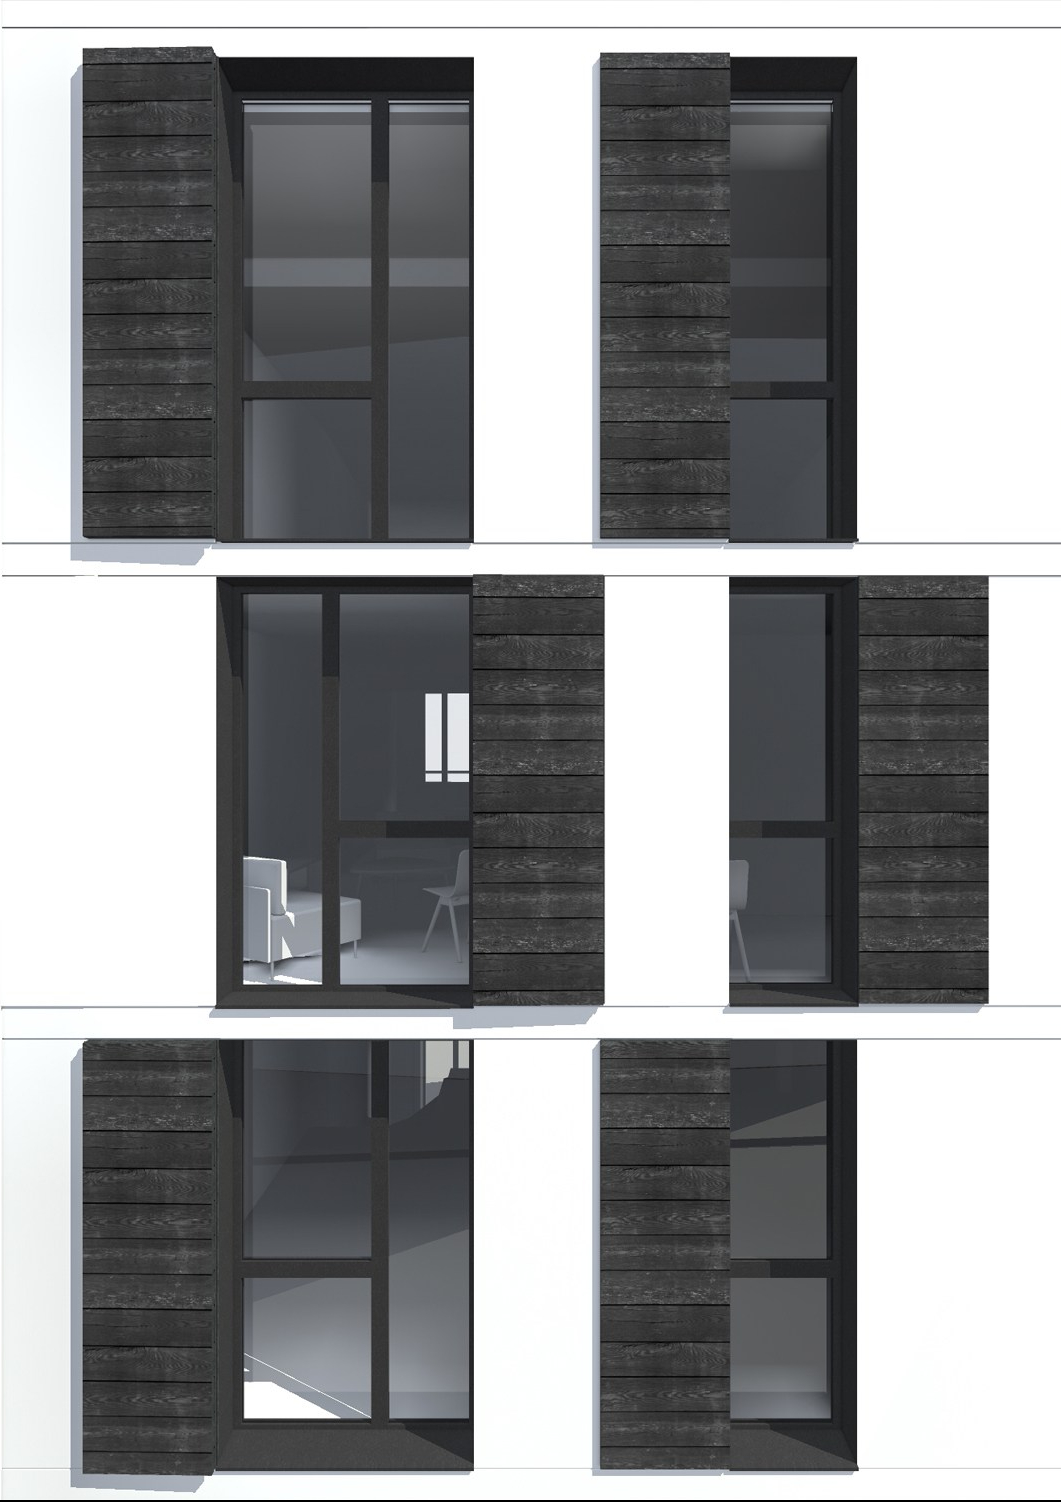 m nilmontant kevin velghe architecte. Black Bedroom Furniture Sets. Home Design Ideas